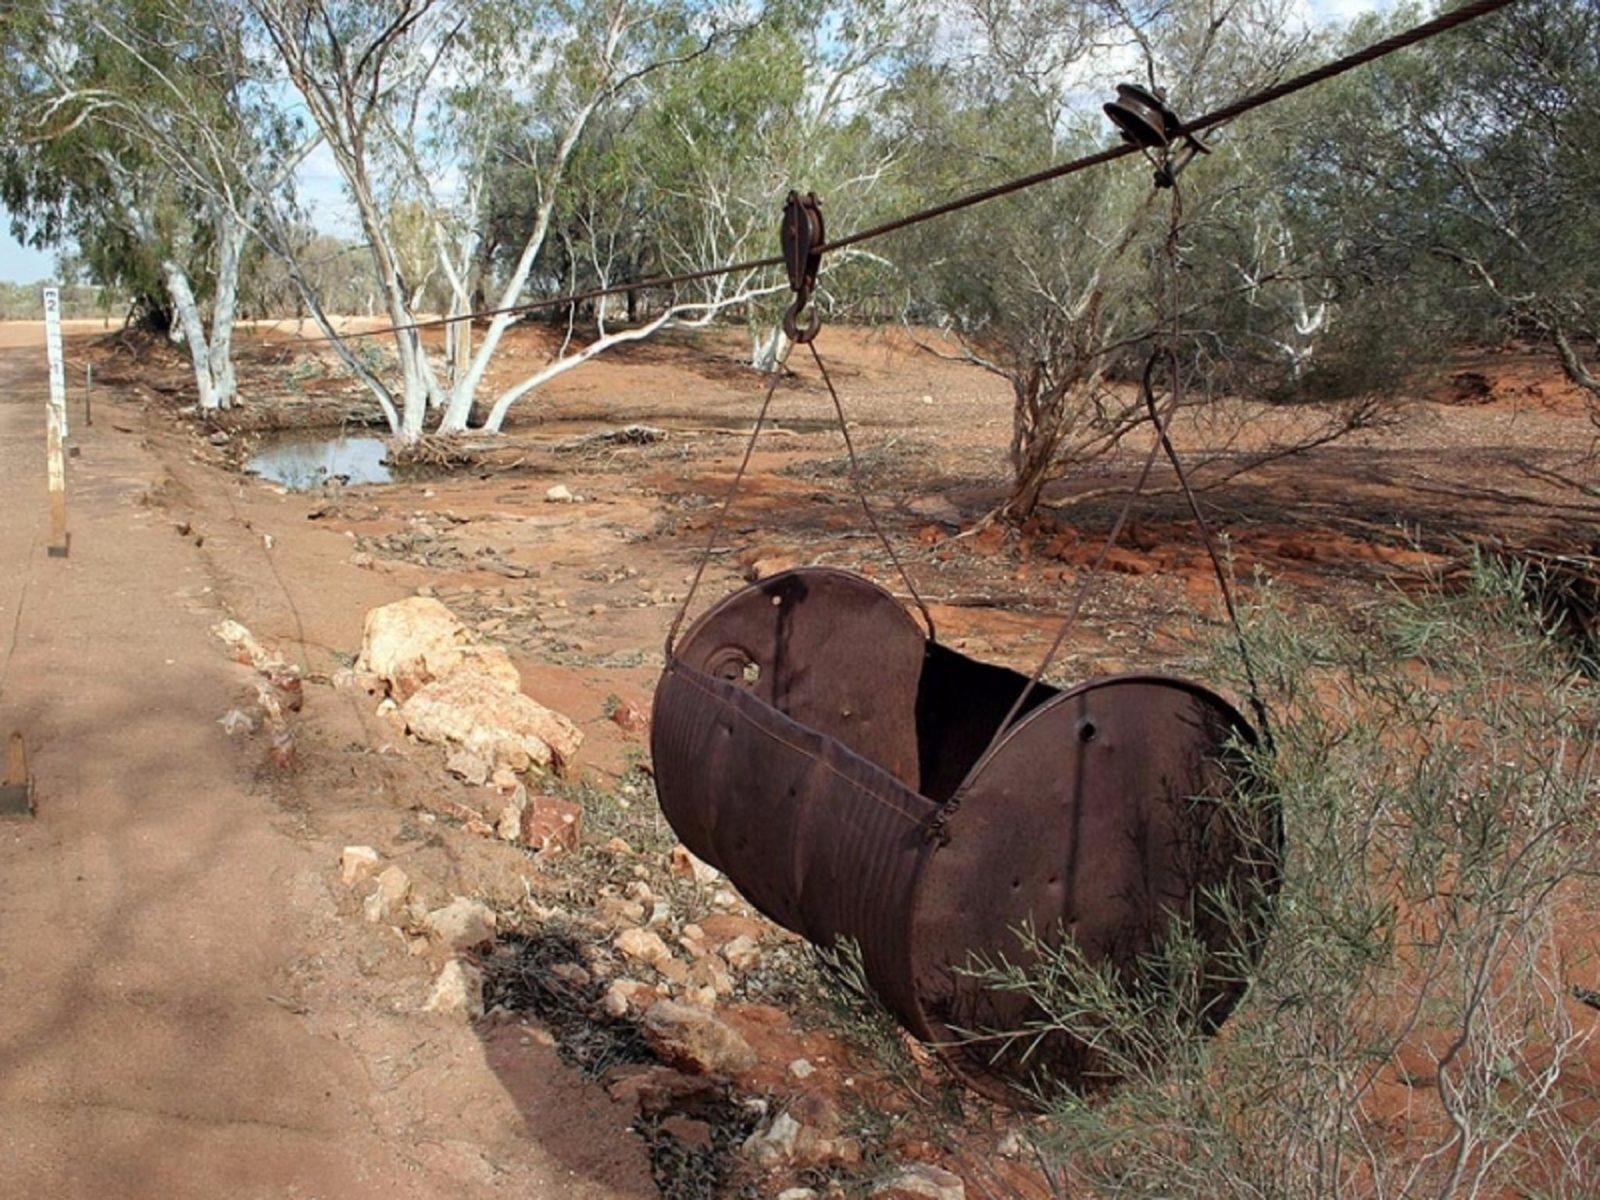 Kingsford Smith Mail Run, Carnarvon, Western Australia